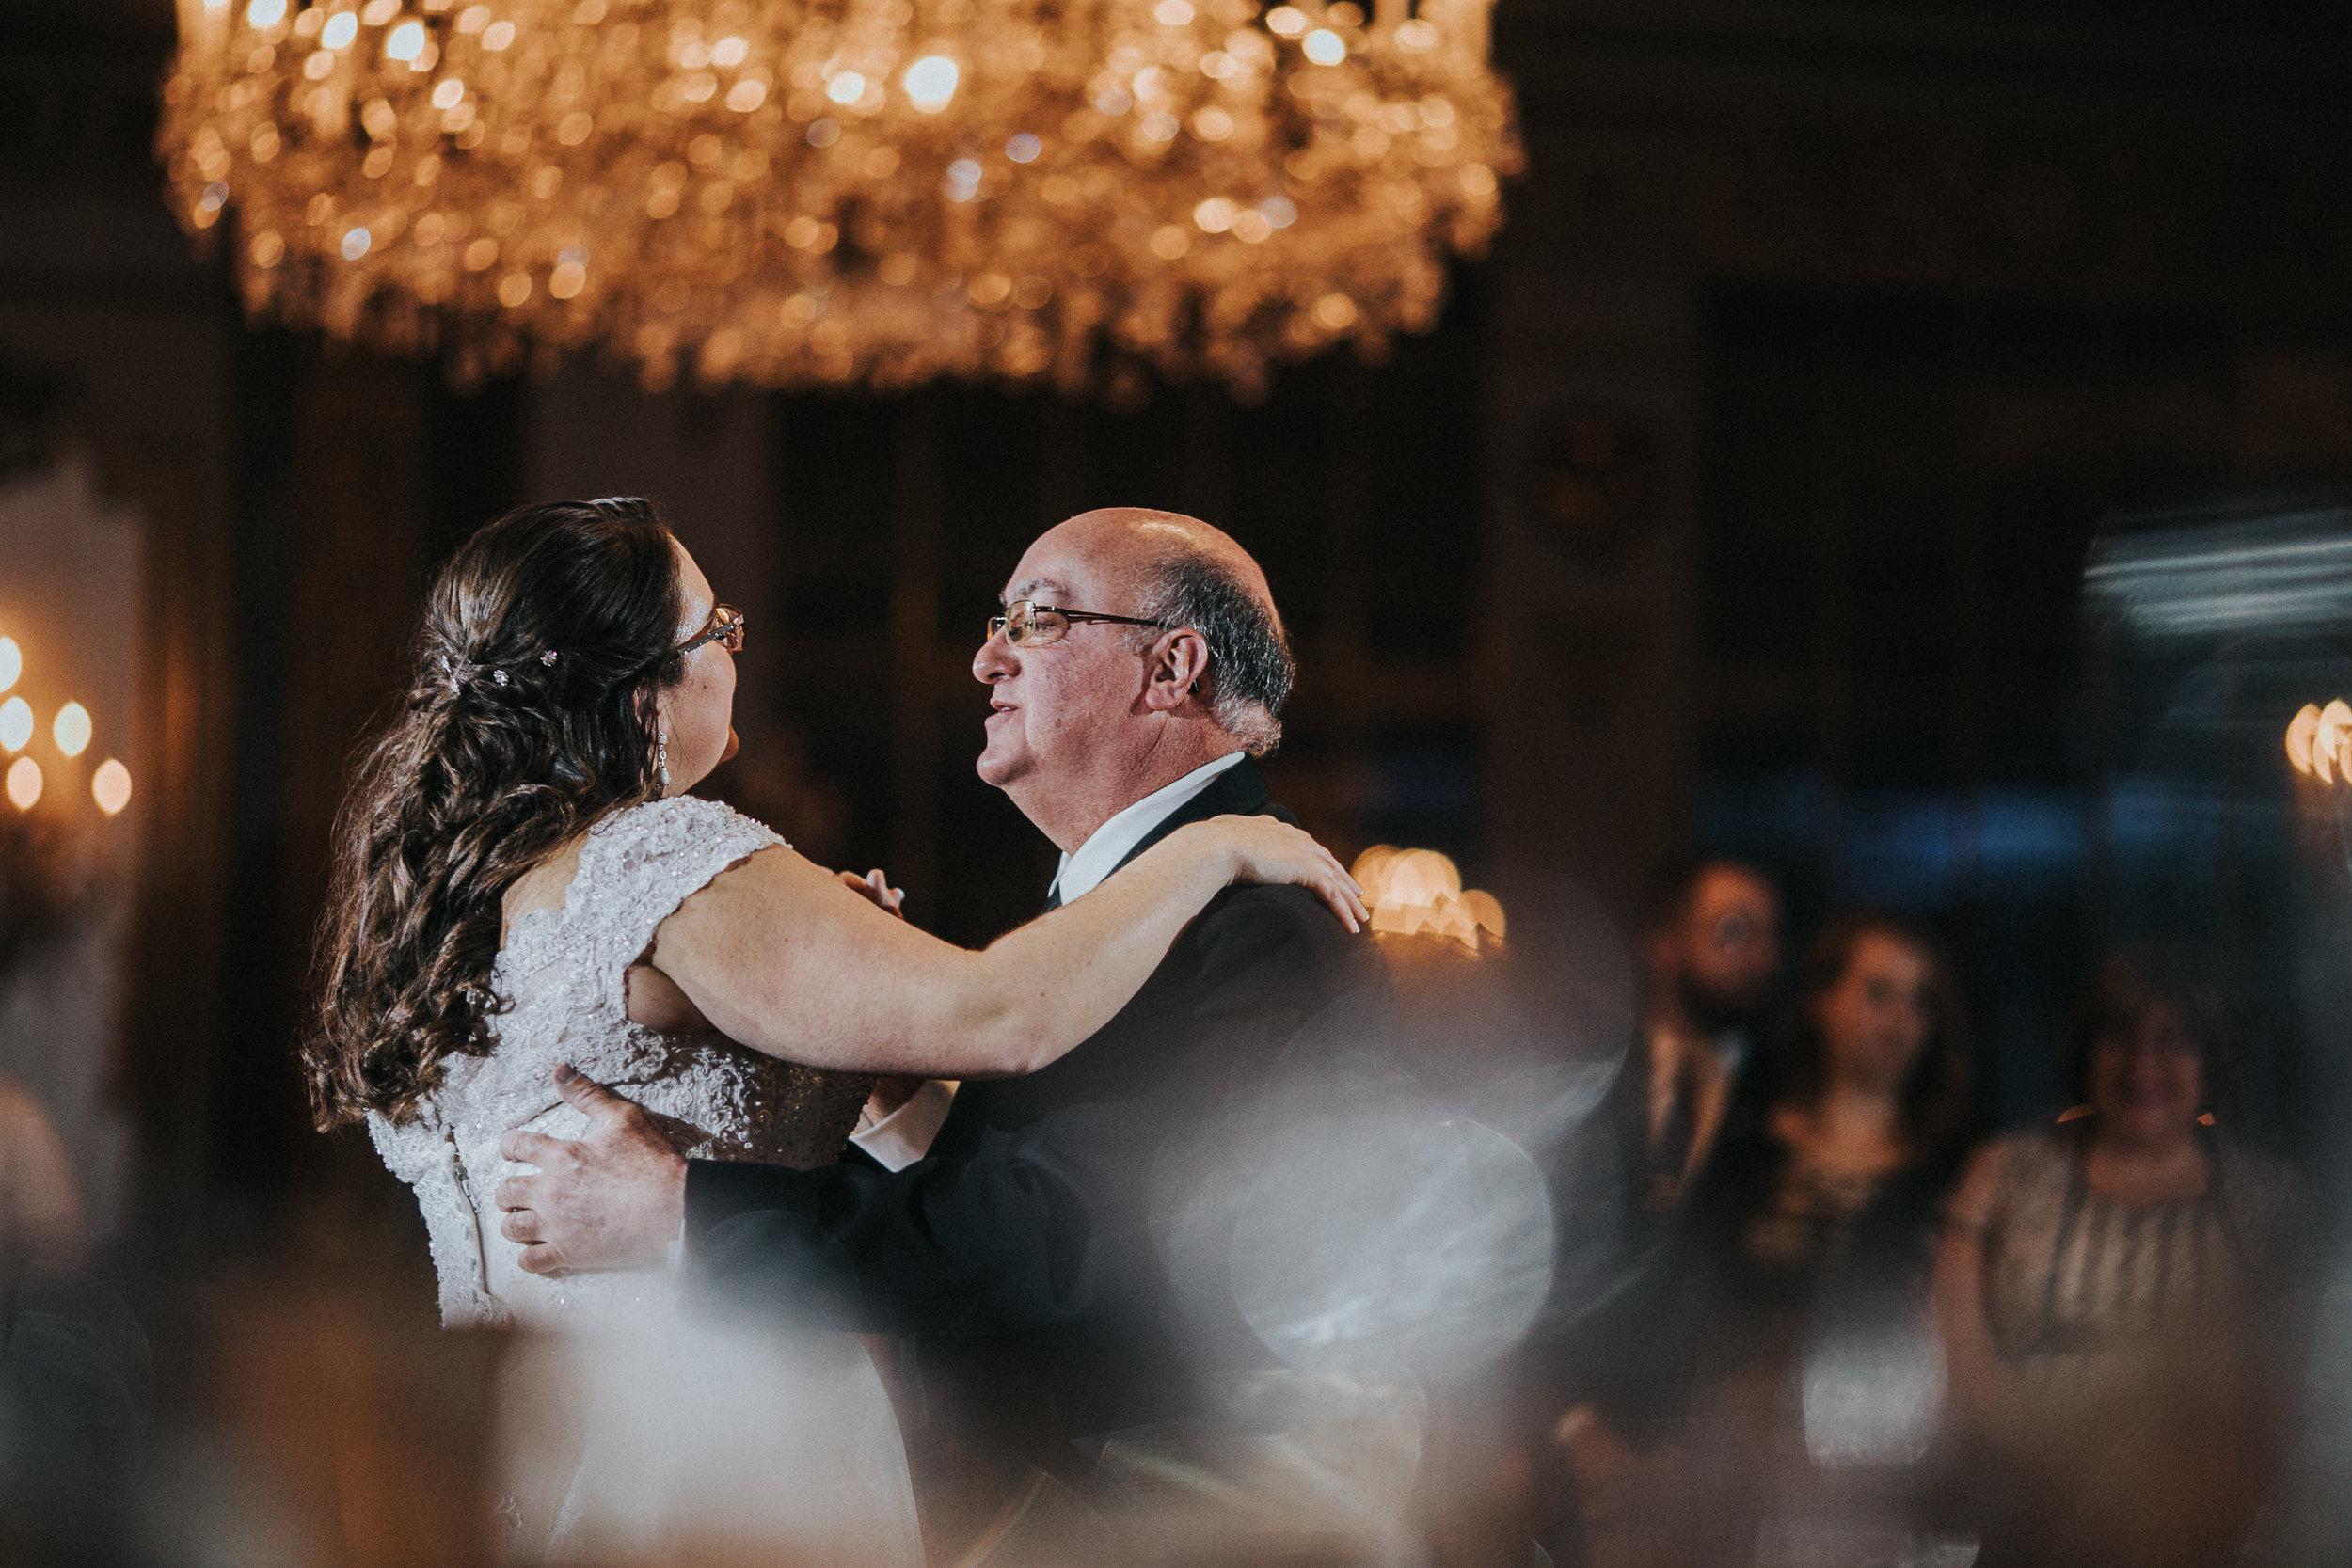 New-Jersey-Wedding-Photography-Fishers-Tudor-House-JennaLynnPhotography-Reception-Kathleen&Eddie-109.jpg